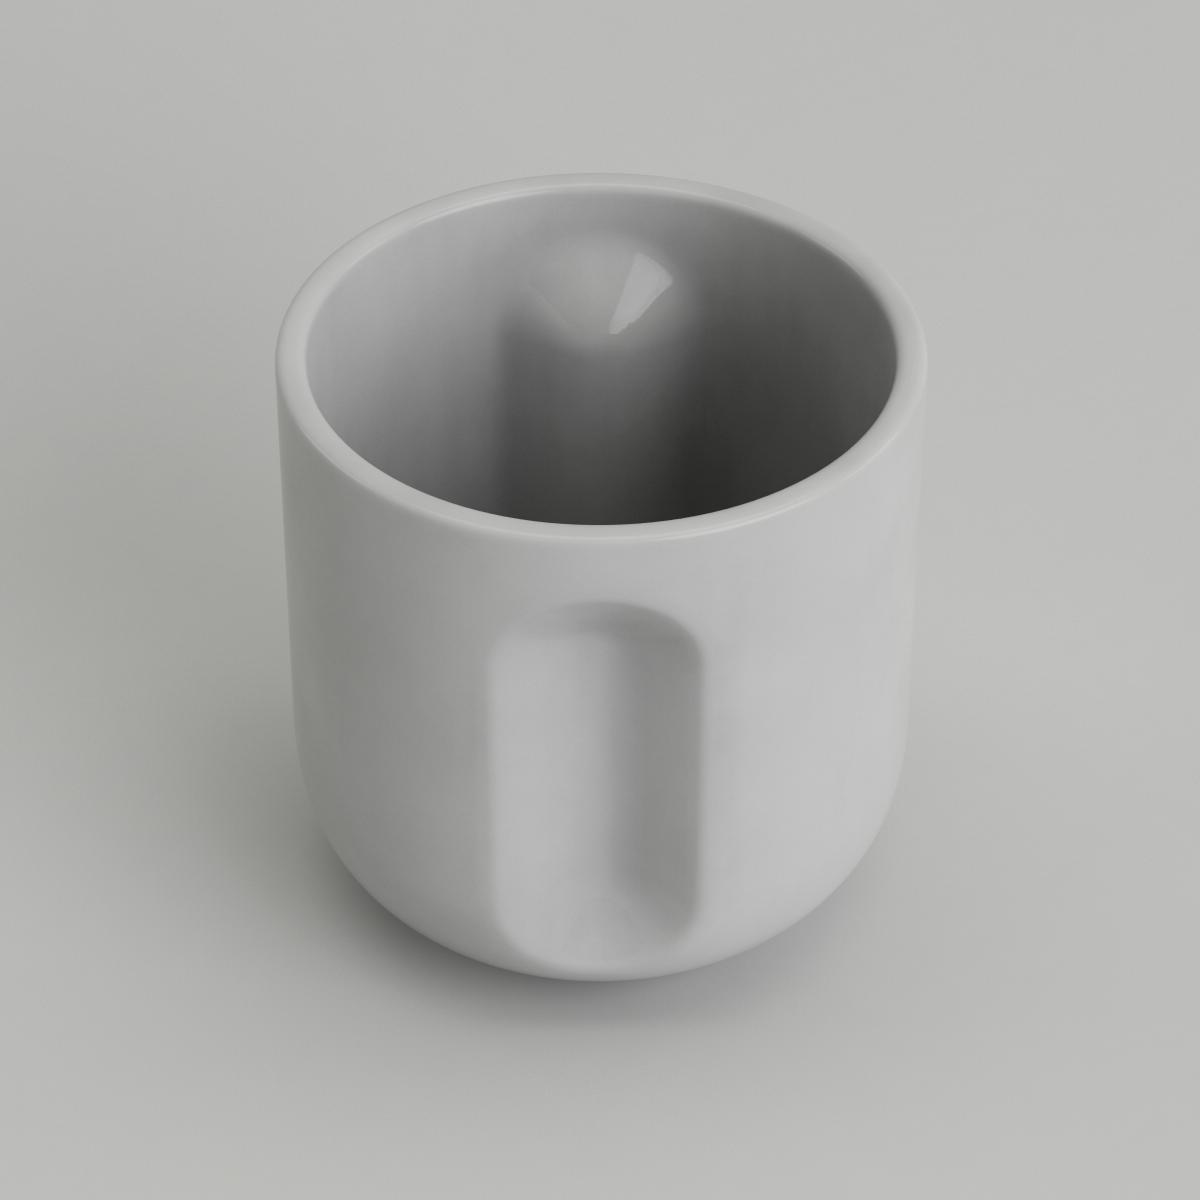 cup porcelain Minimalism coffee cup